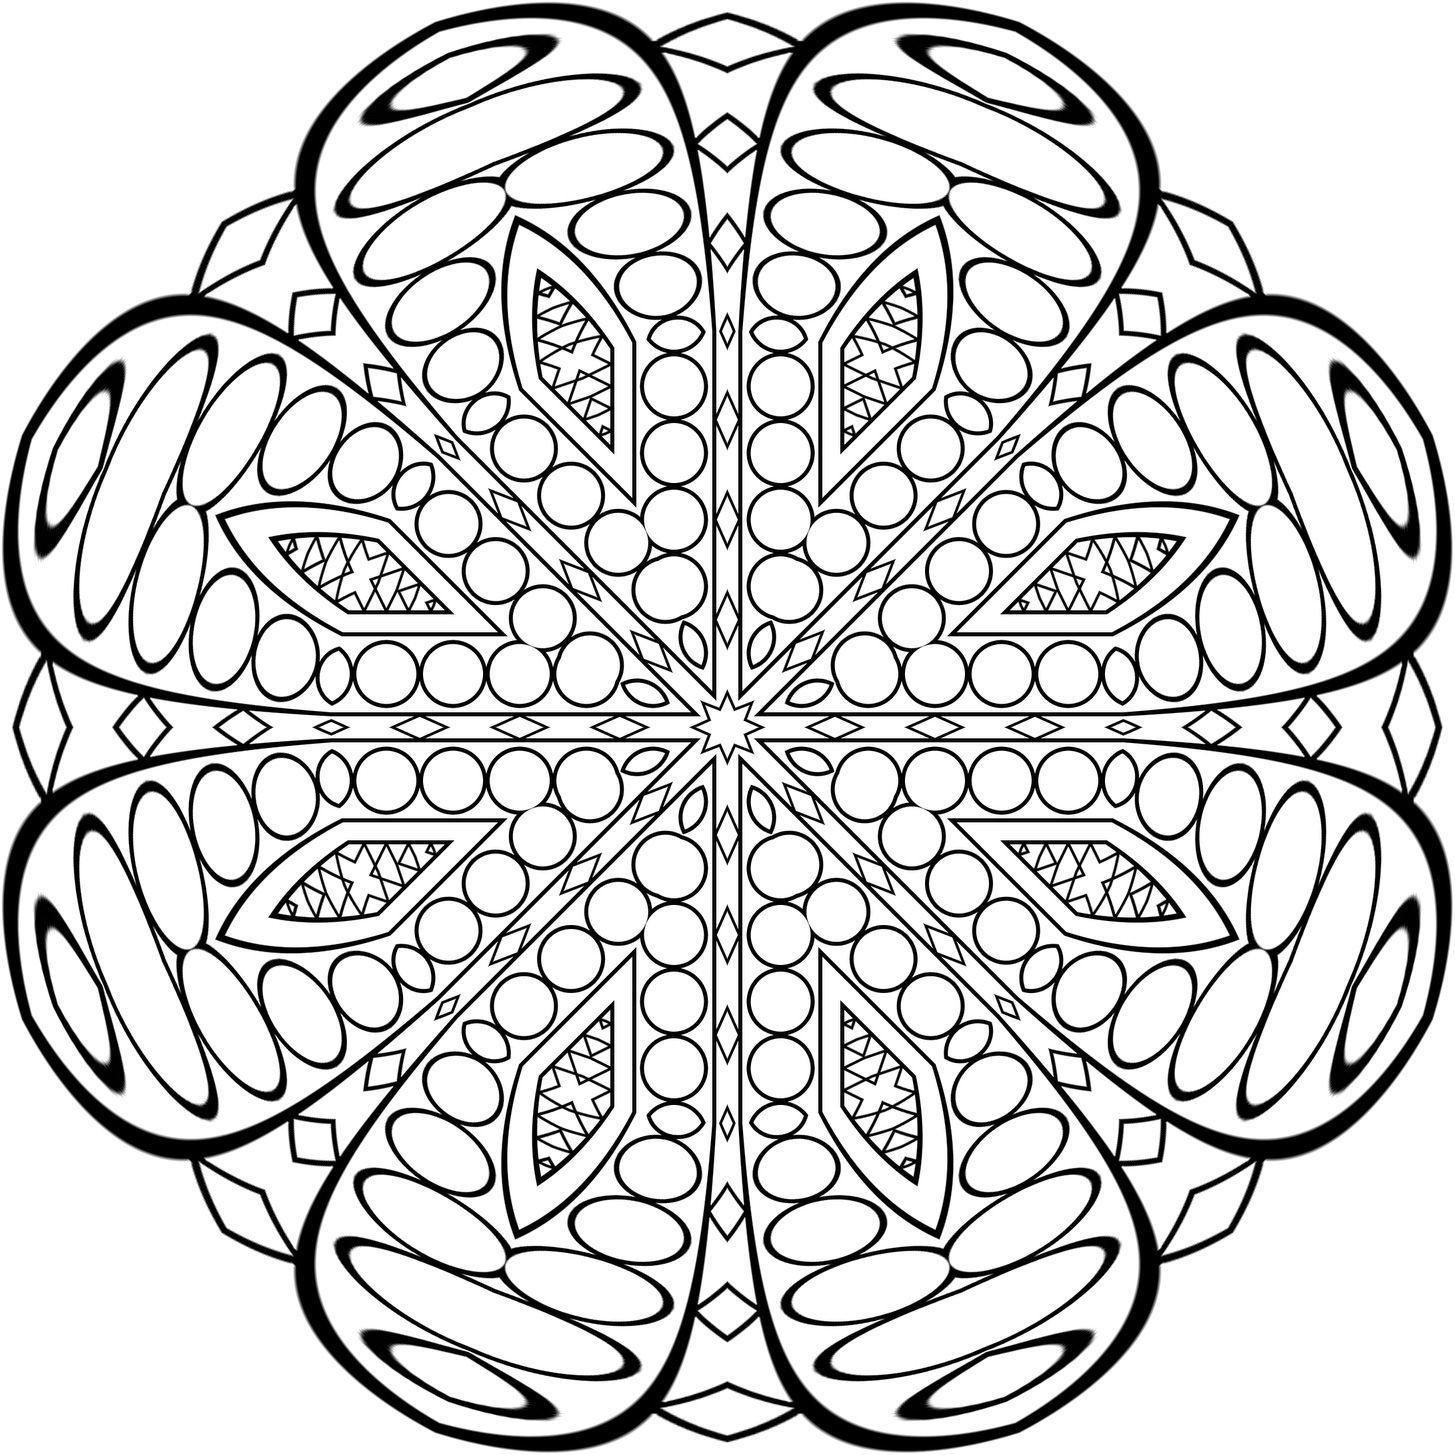 сова раскраска антистресс - Поиск в Google | Mandala ...